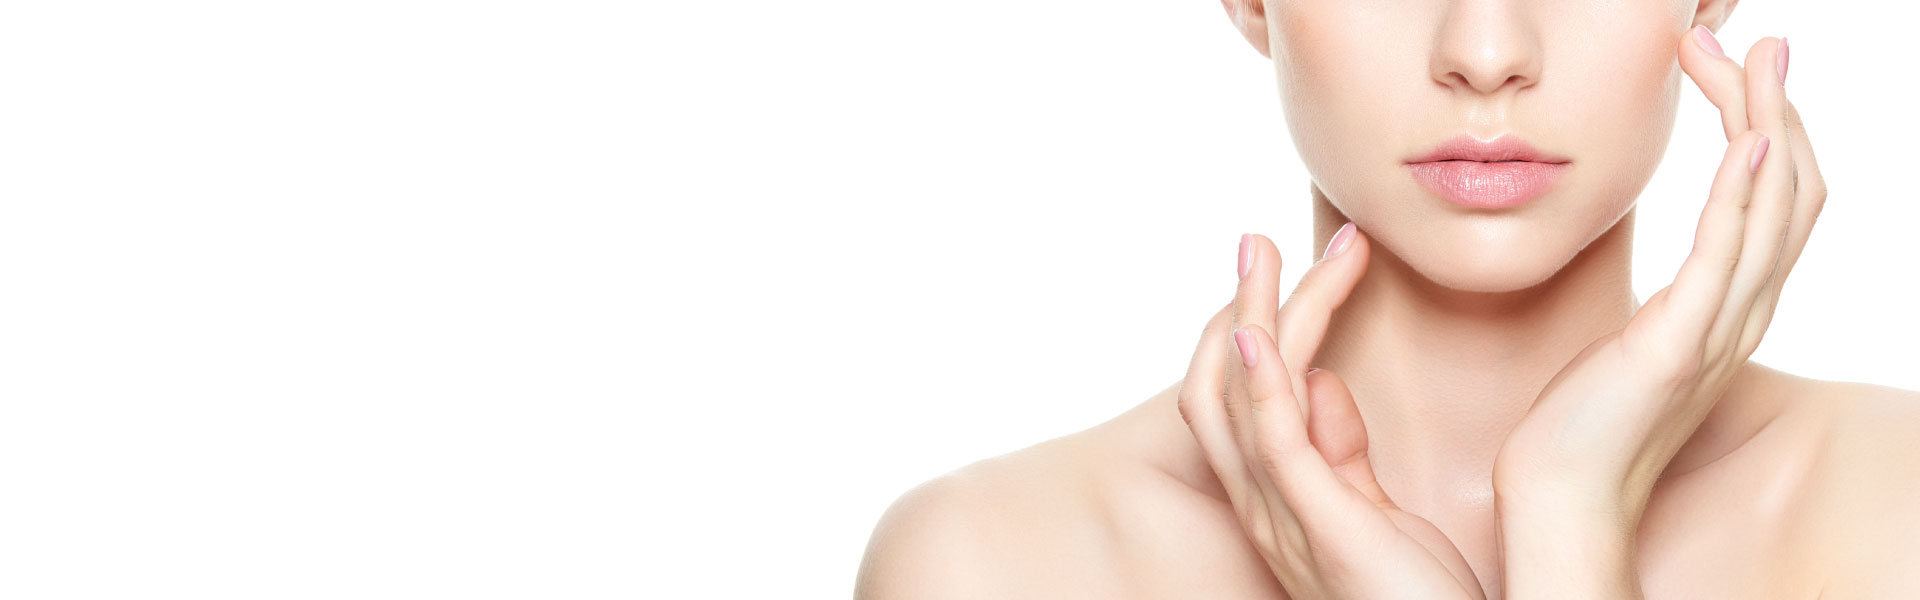 Cheshire Aesthetic Clinic   Skin Care Dermapen IPL Laser Treatment   Face